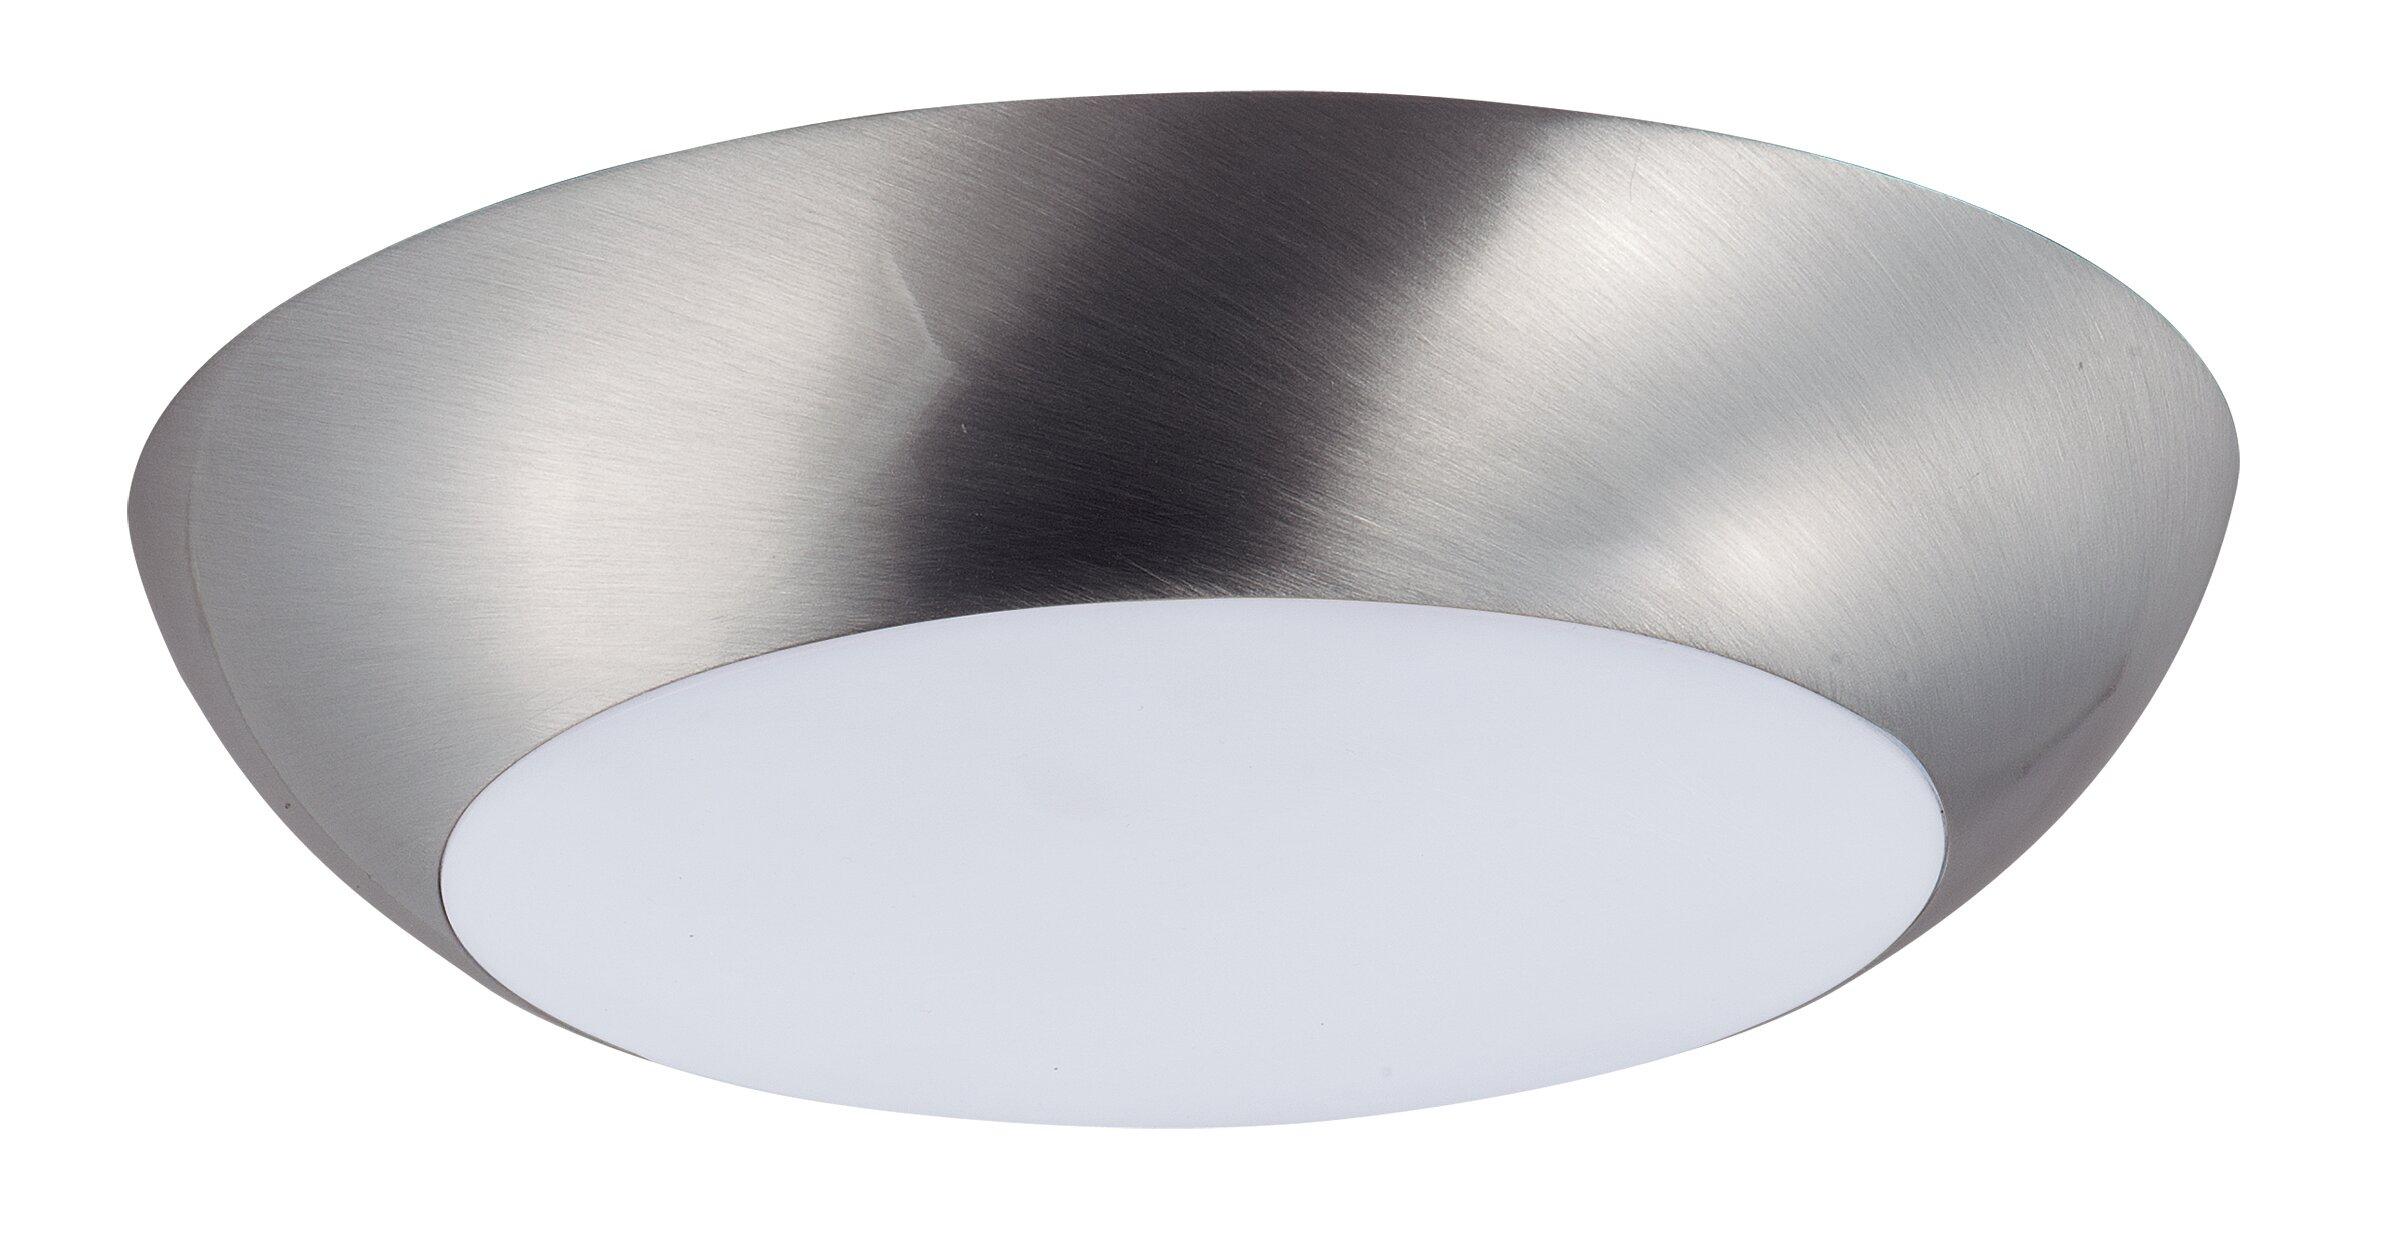 Ebern Designs Lospalmos 1 Light 6 5 Simple Circle Flush Mount Reviews Wayfair